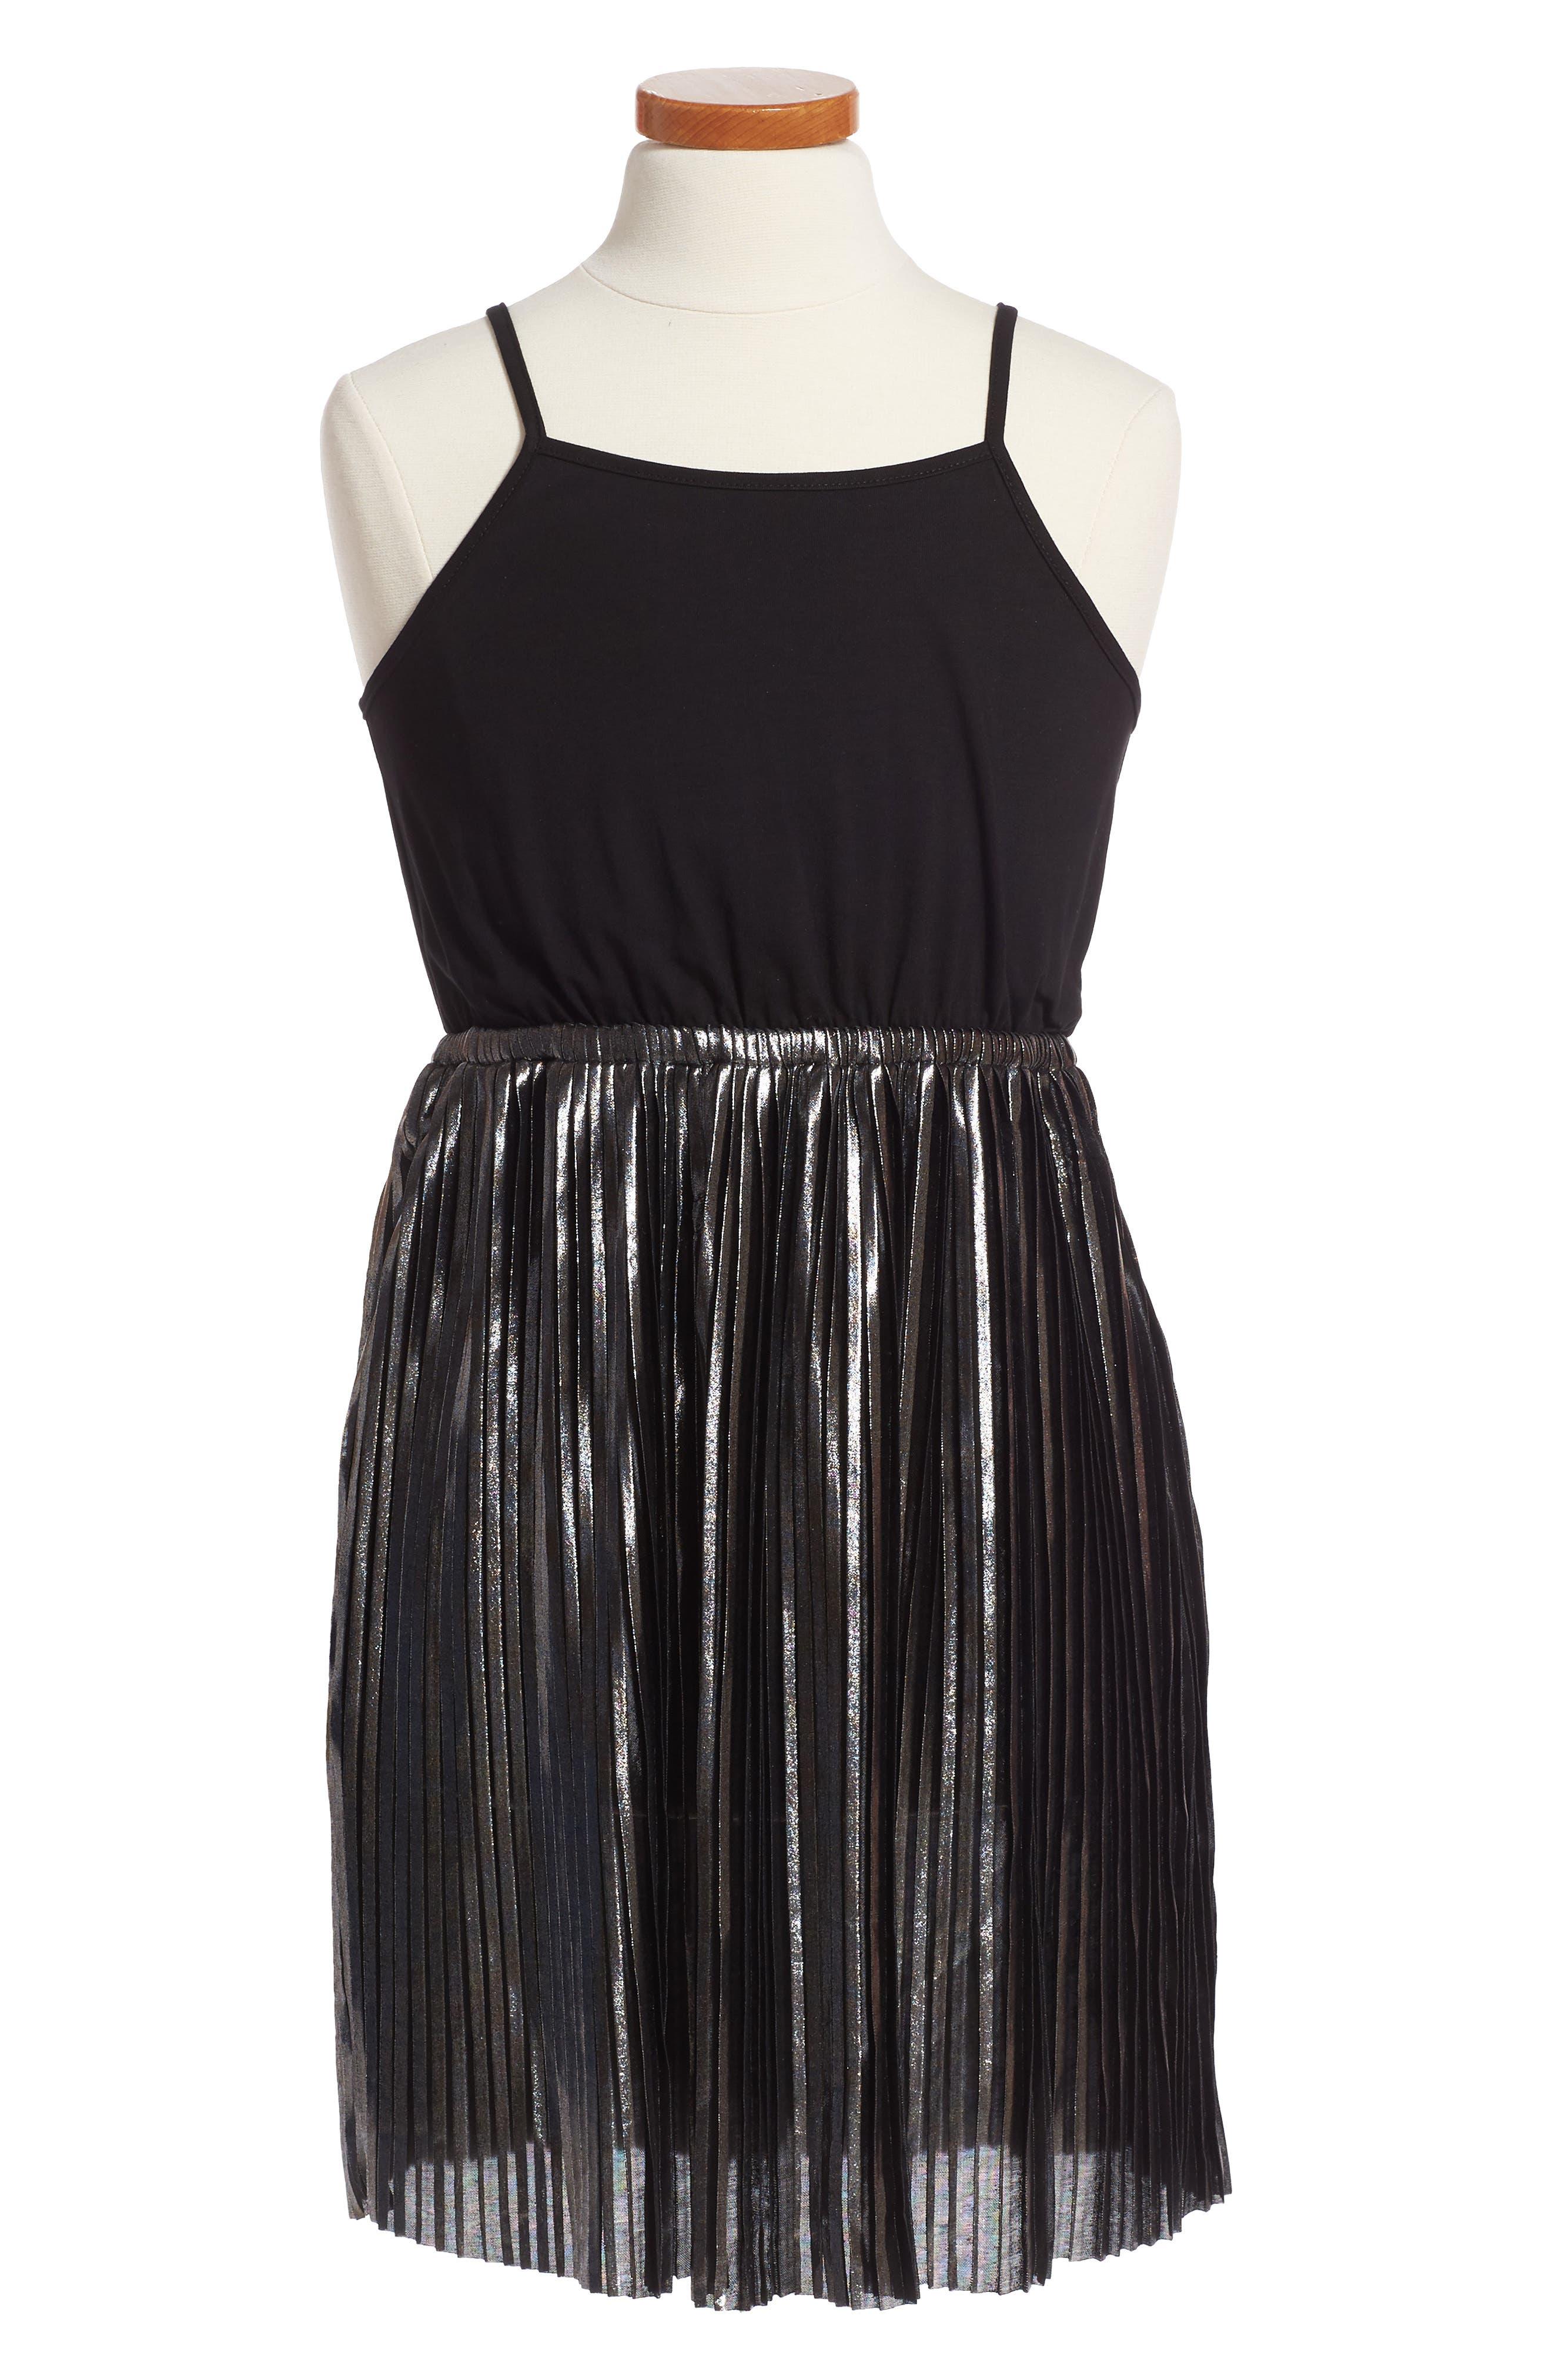 Main Image - Bardot Junior Metallic Sleeveless Dress (Big Girls)